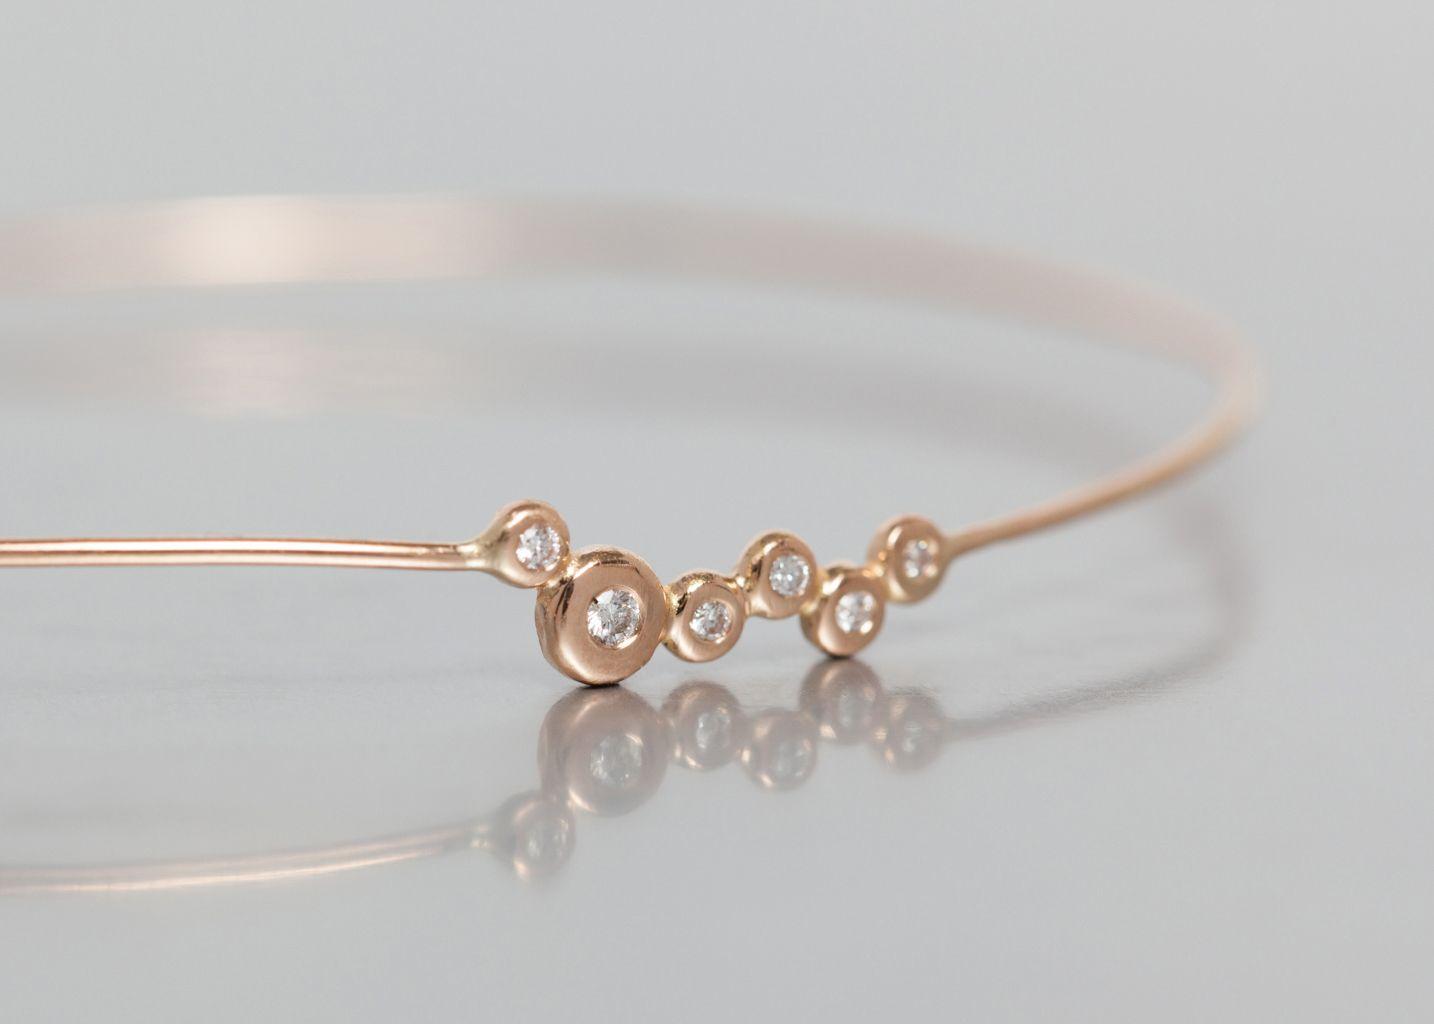 Bracelet Sofia - Monsieur